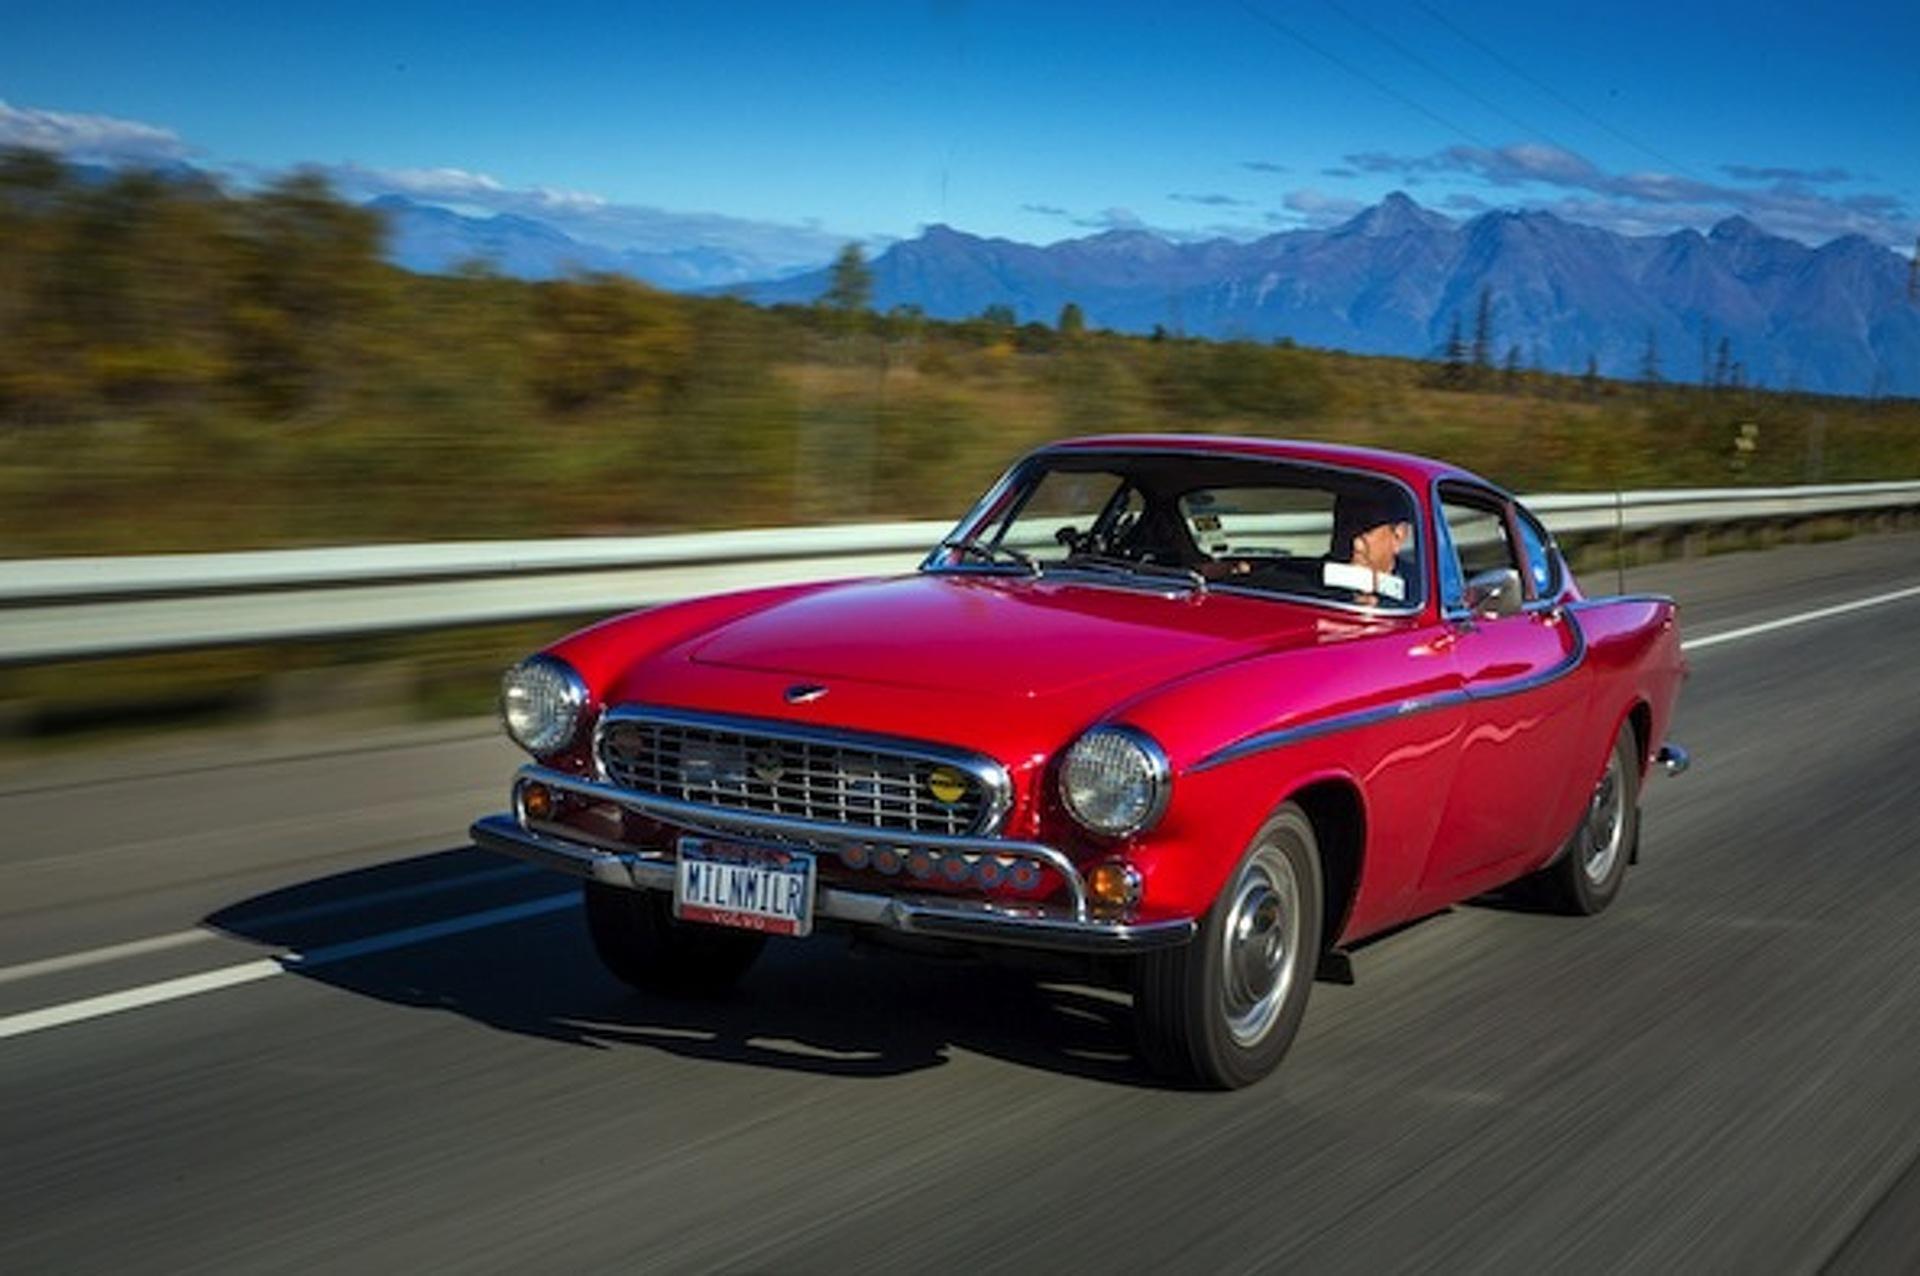 Owner of three million mile Volvo P1800S dies